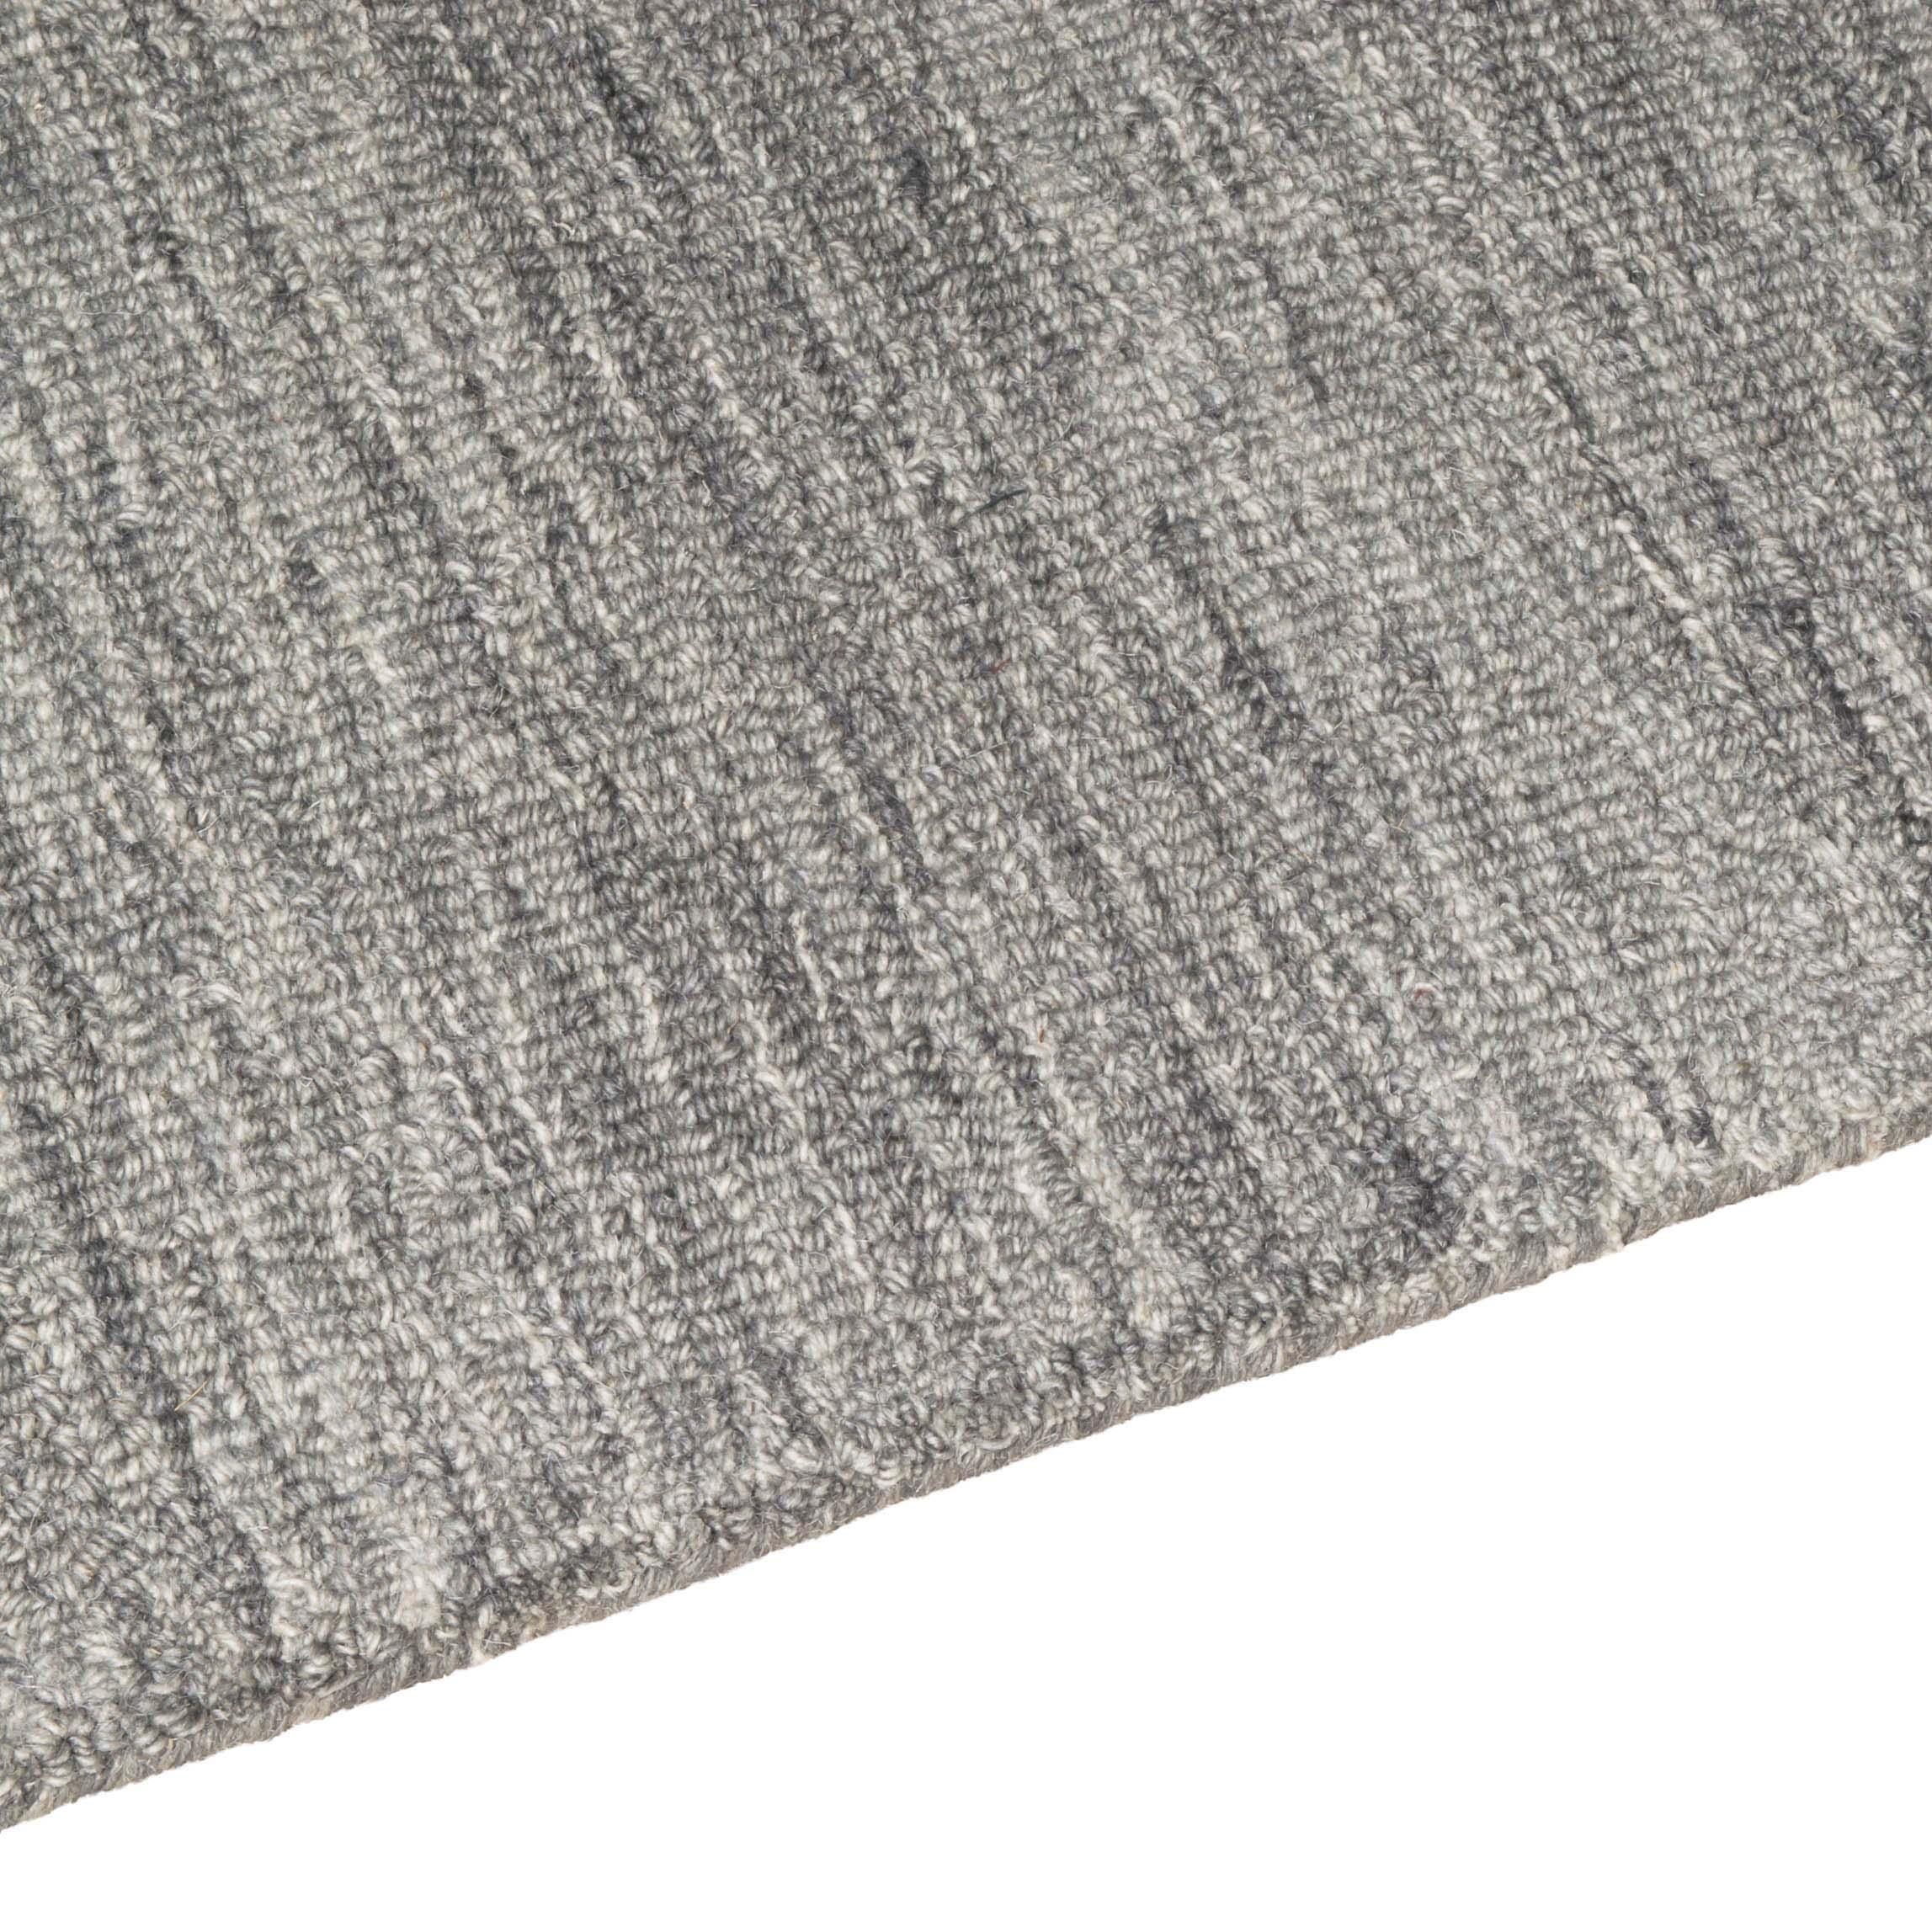 MARLST1_Marled_Steel_160x230-edge